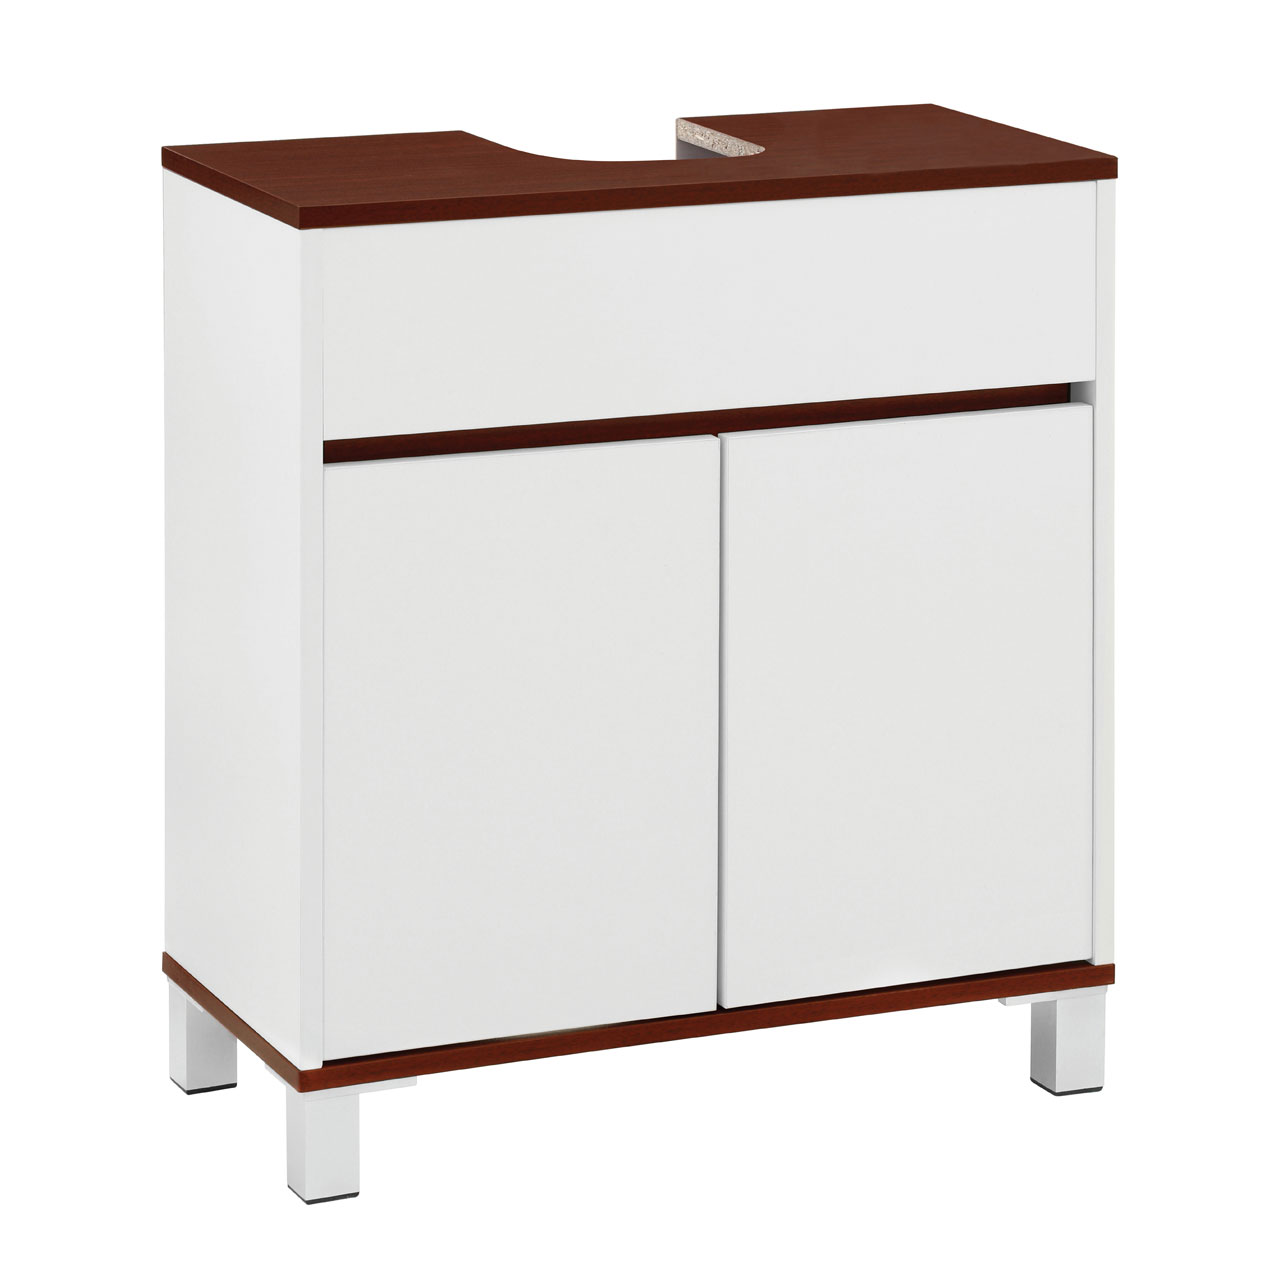 white wooden bathroom furniture. under sink white wooden bathroom cabinet double door walnut veneer storage rack furniture